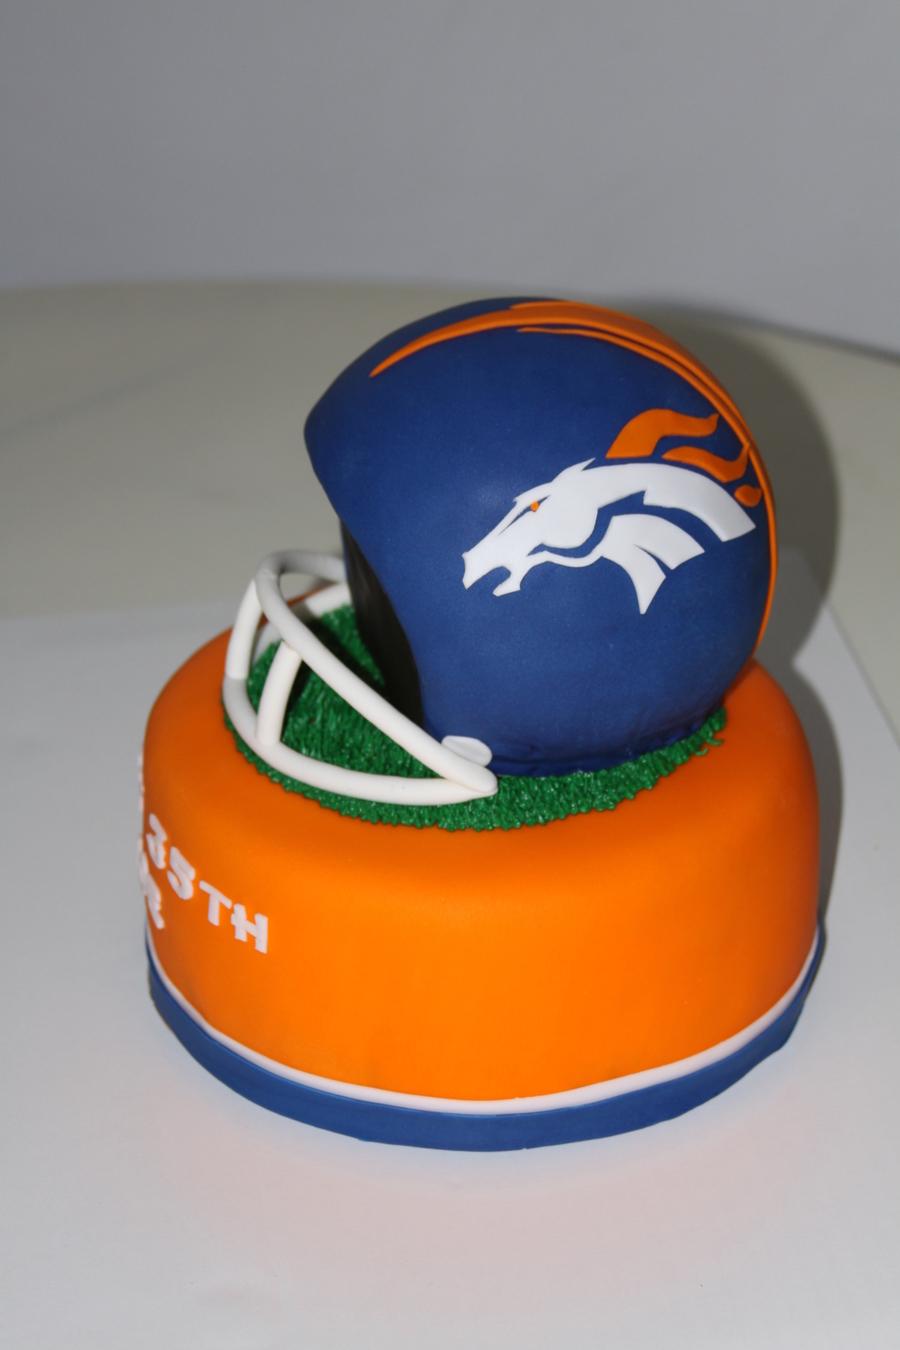 Denver Broncos Birthday Cake Images